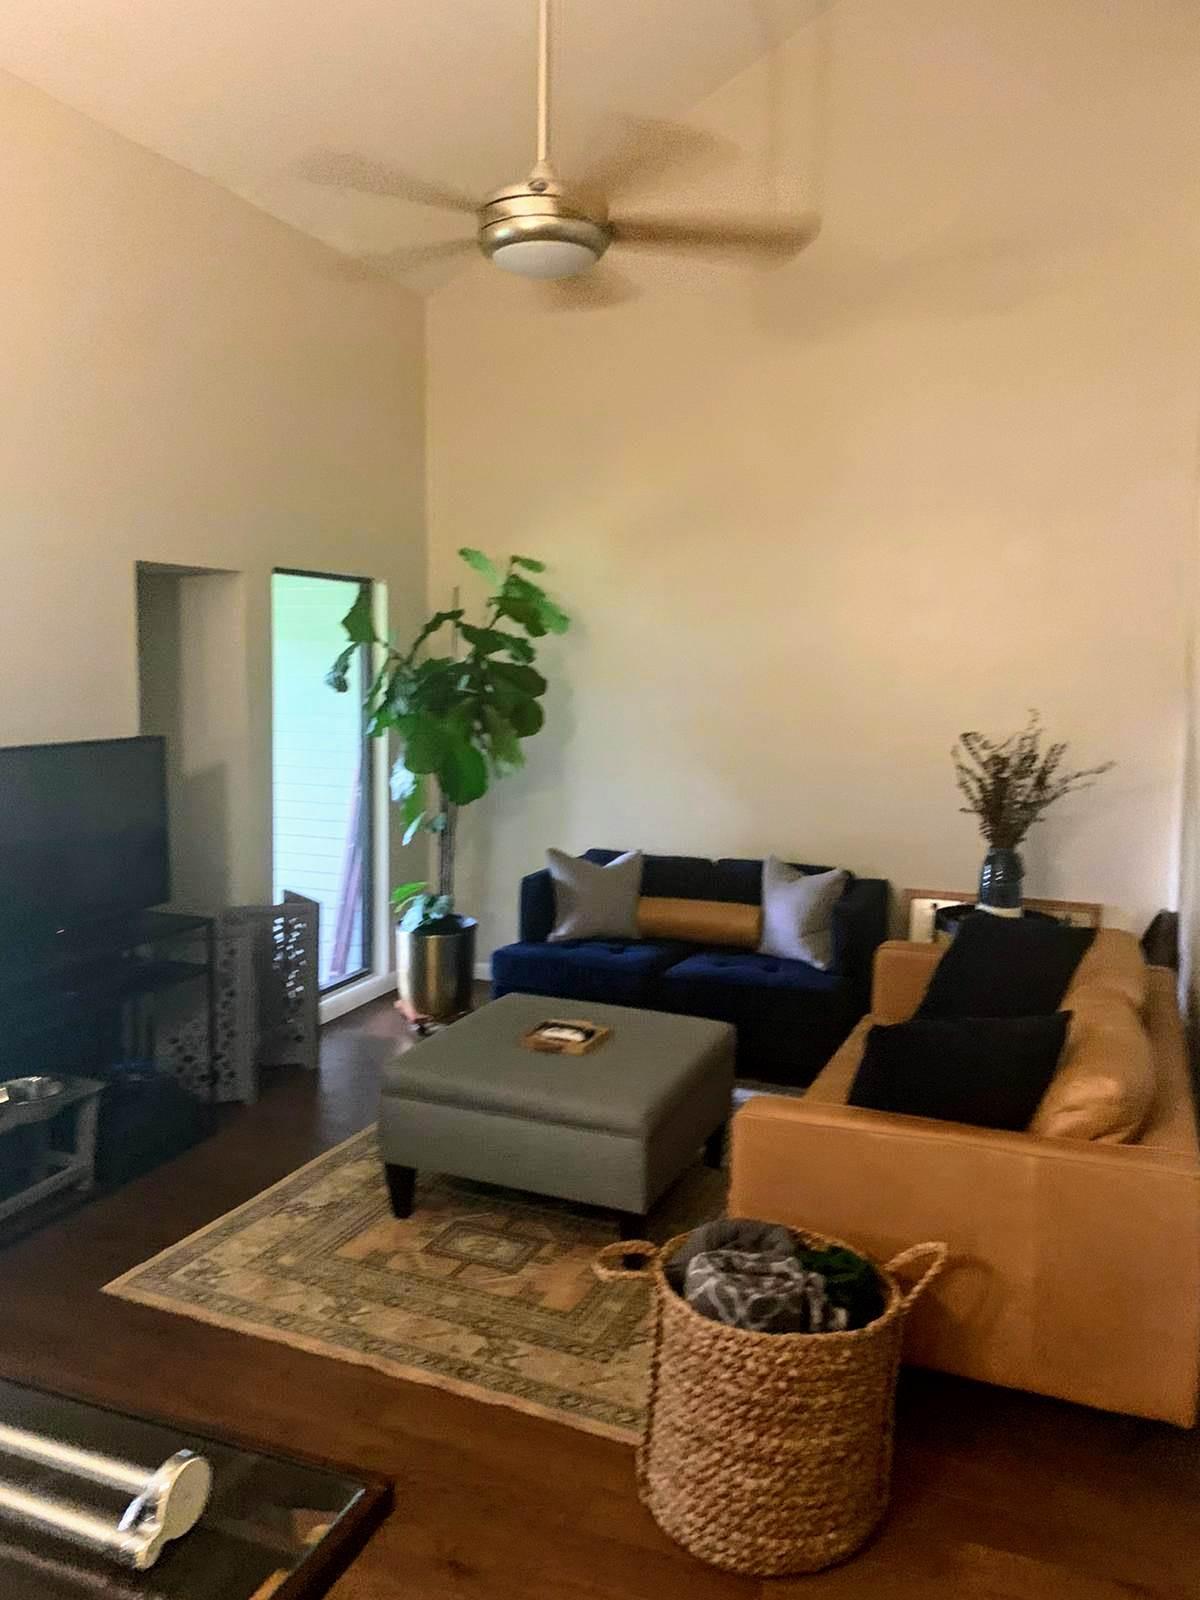 556 Breckenridge Village #209, Altamonte Springs, FL 32714